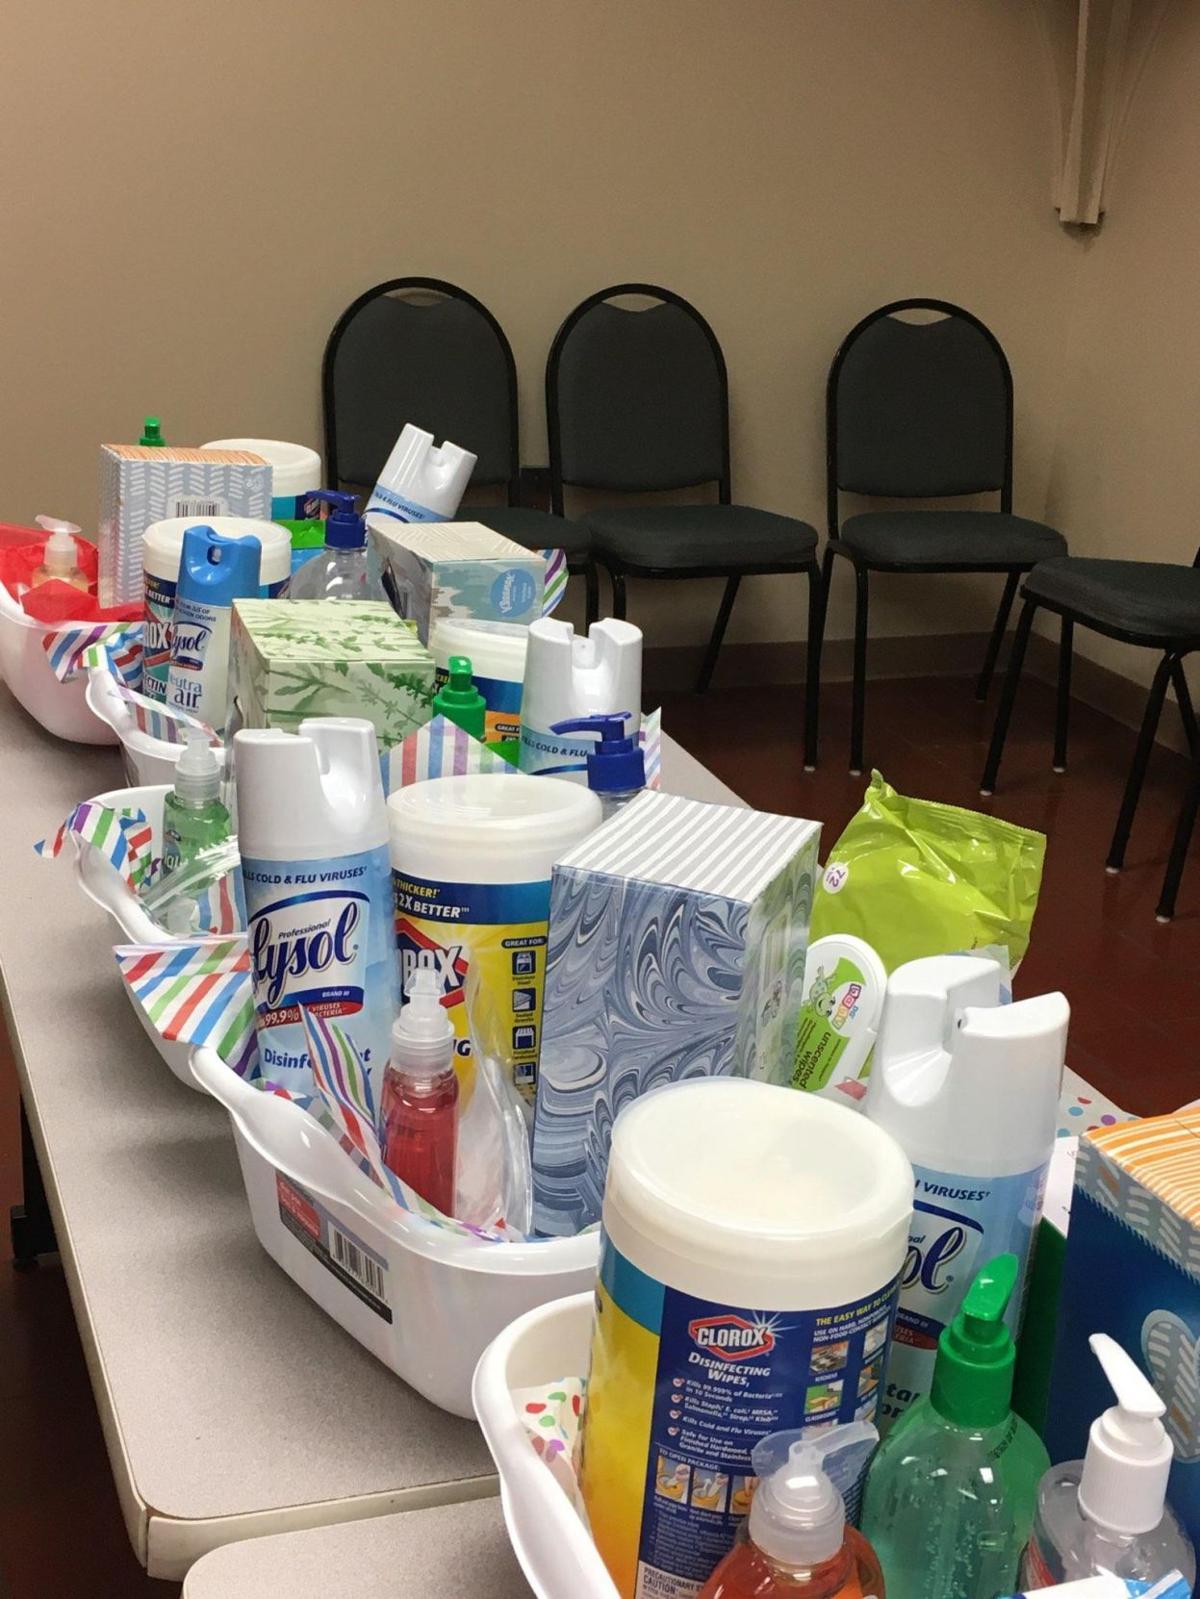 Talladega Optimist Club prepares, delivers clean hands kits to classrooms